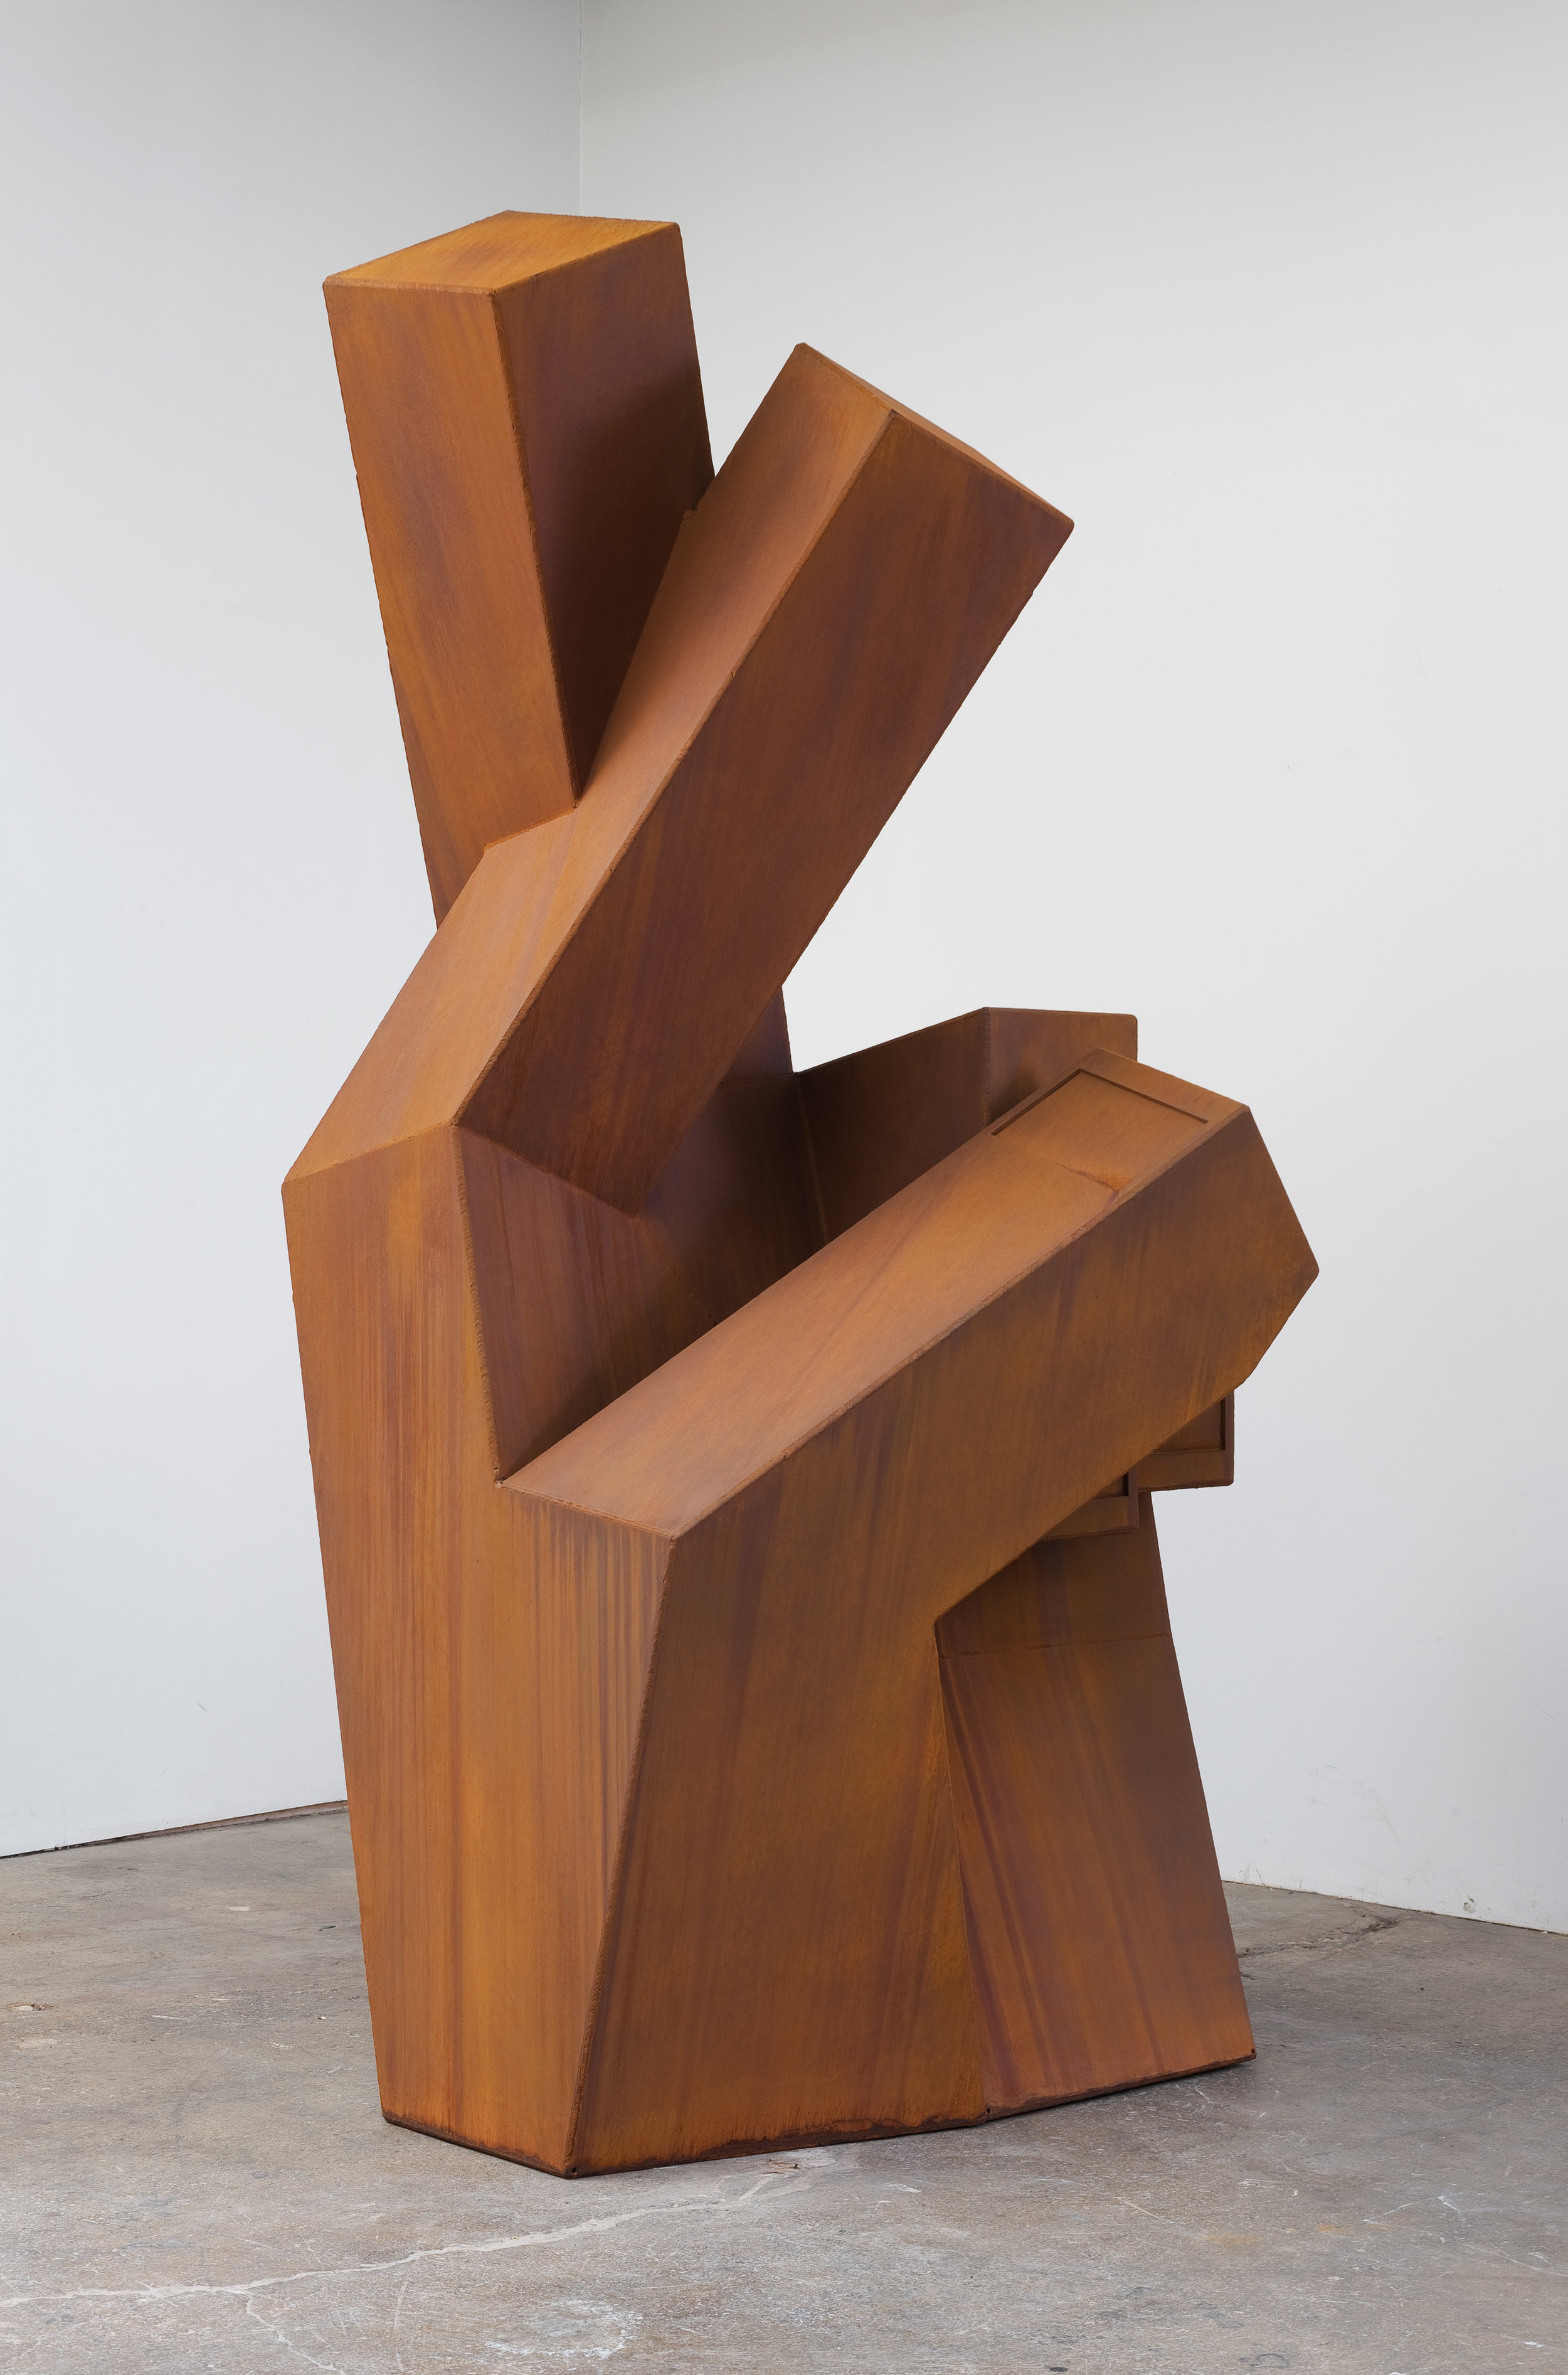 Heavy Handed (Crossed Obelisk), 2012 steel 216,7 x 137,2 x 119 cm - 85 3/8 x 54 x 46 3/4 inches